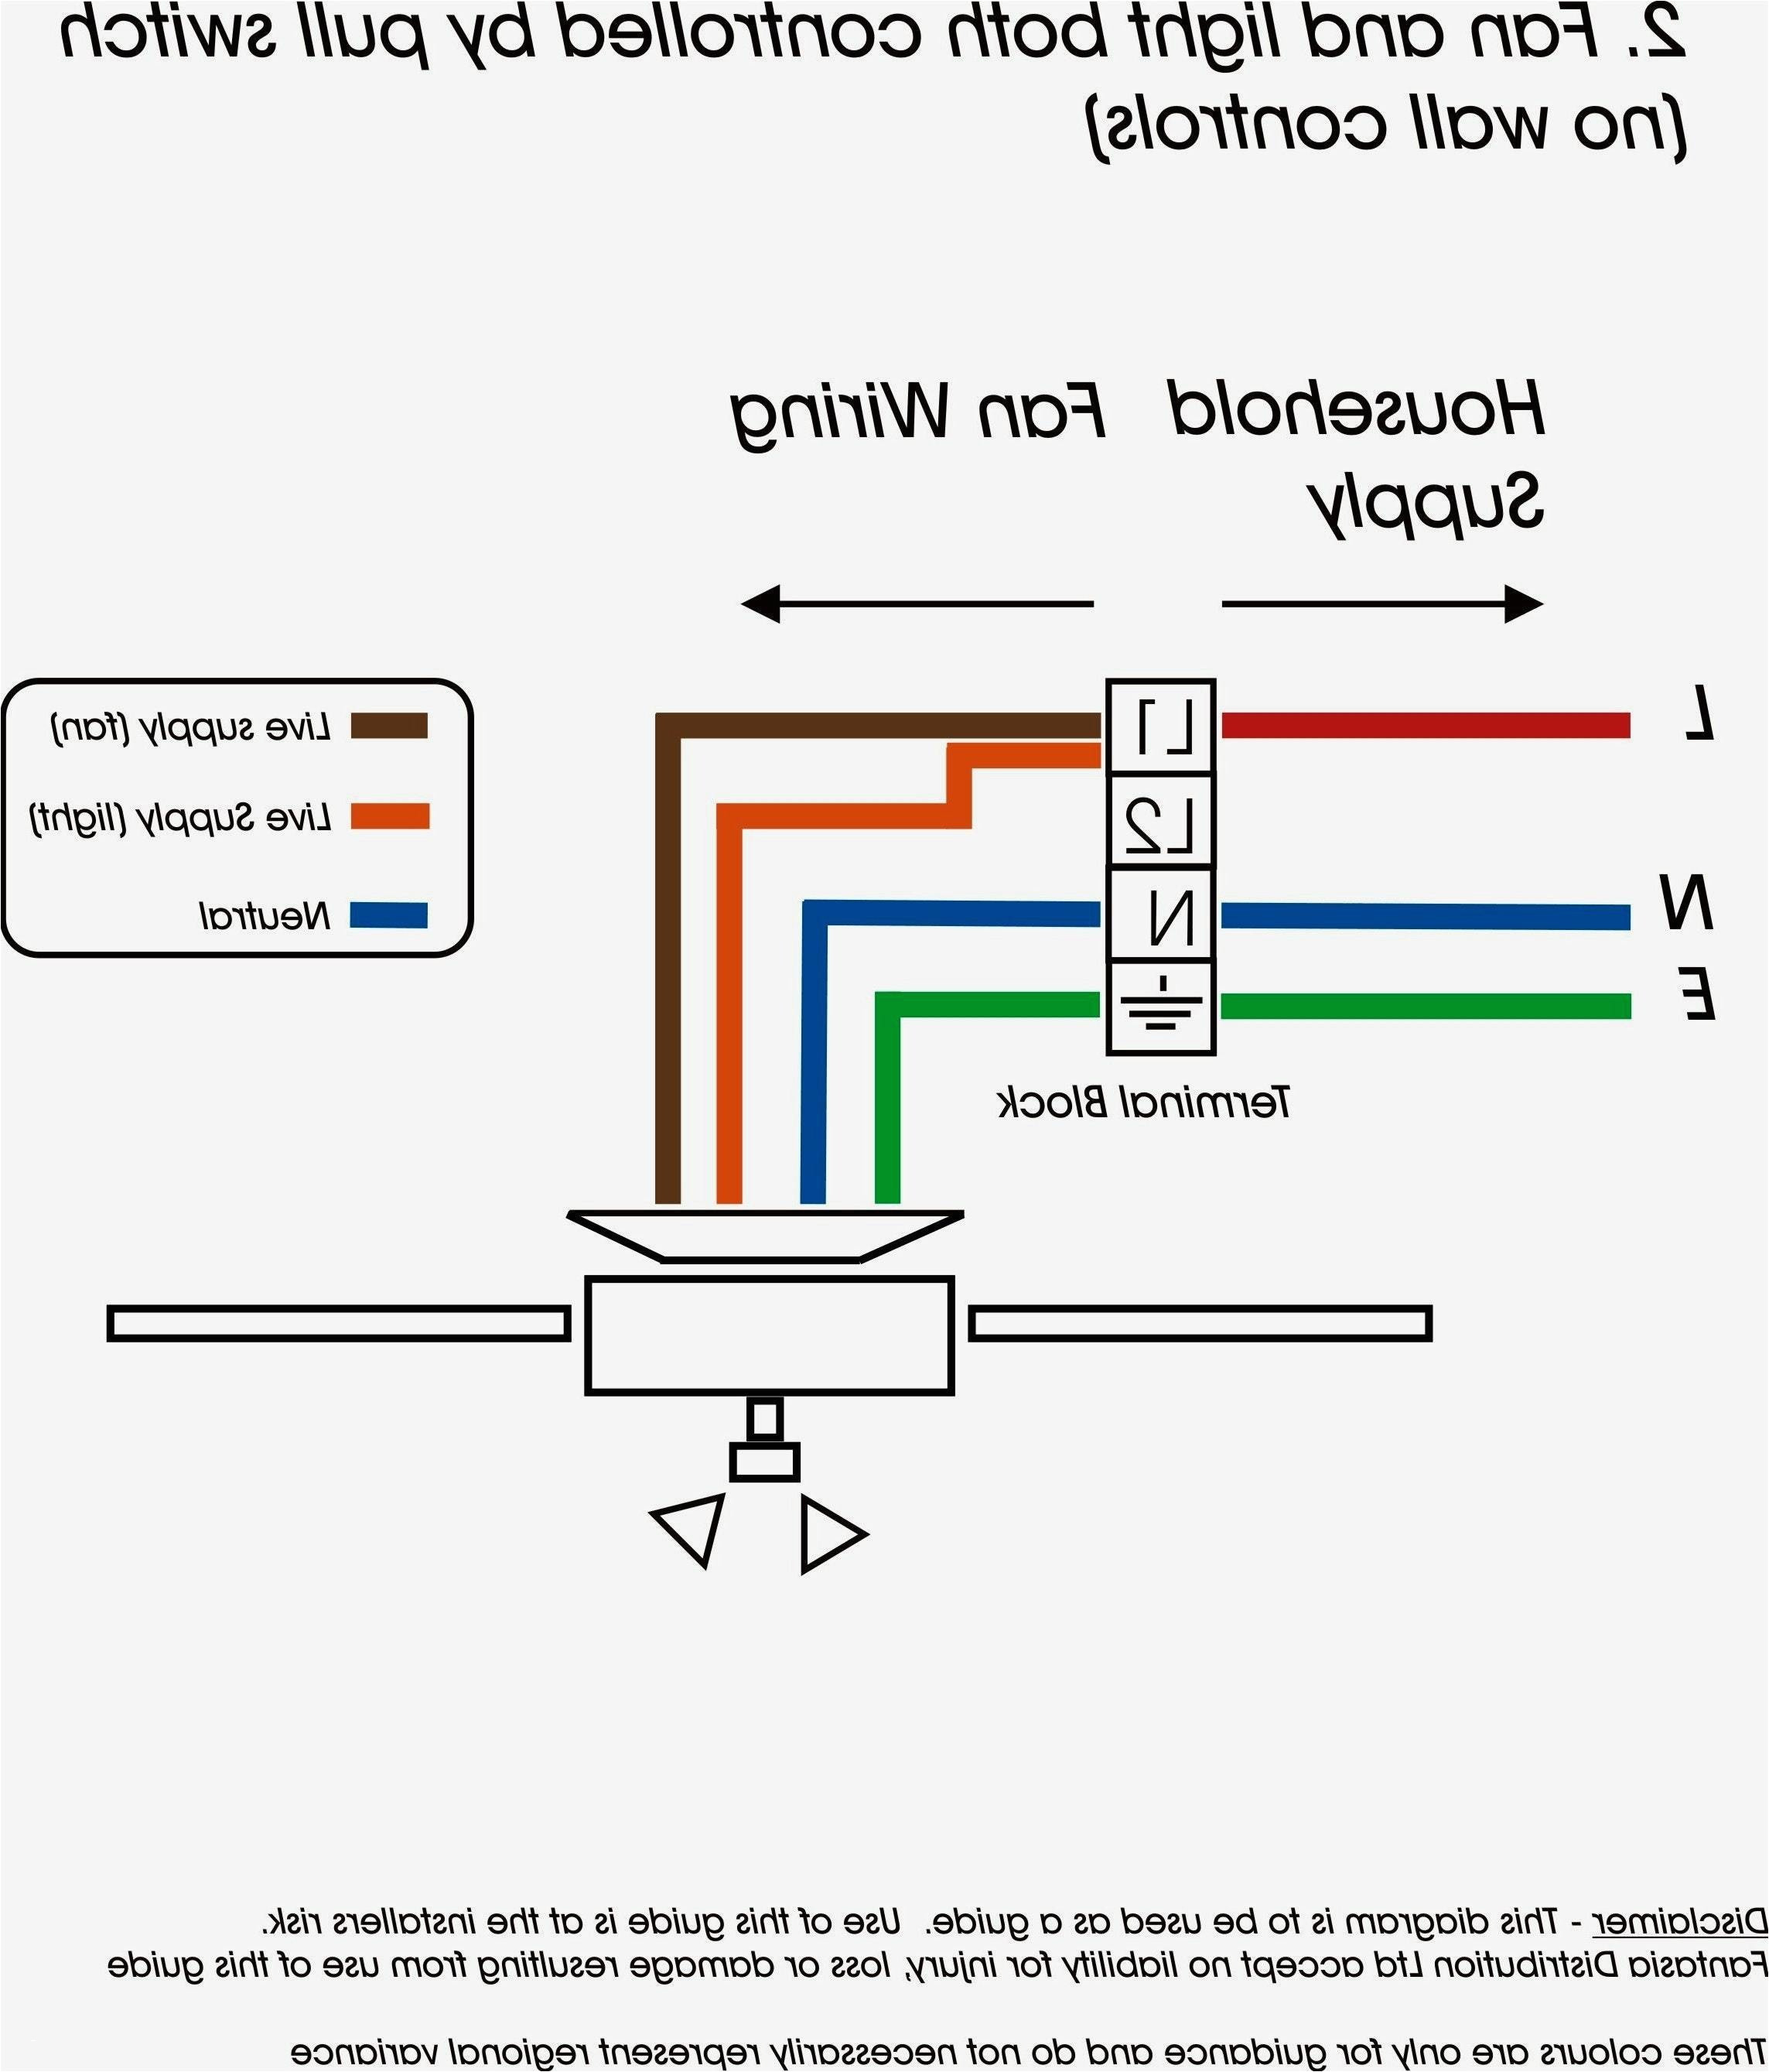 480v to 120v Transformer Wiring Diagram Wiring Diagrams In Addition 480 Single Phase Transformer Wiring